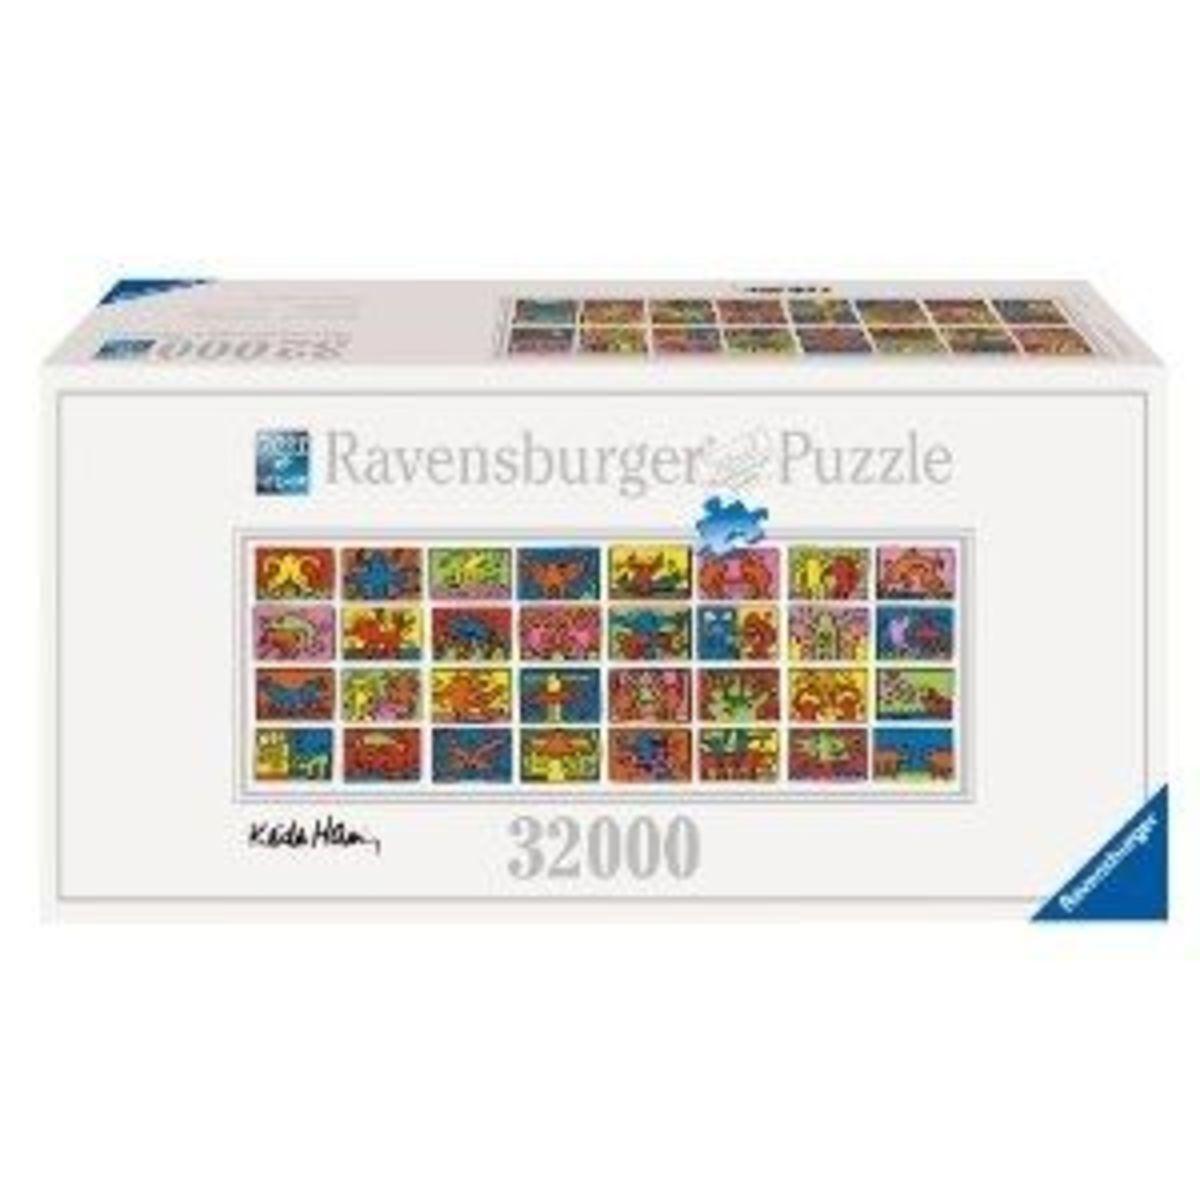 Ravensburger-32,000 pieces of True Family Fun!